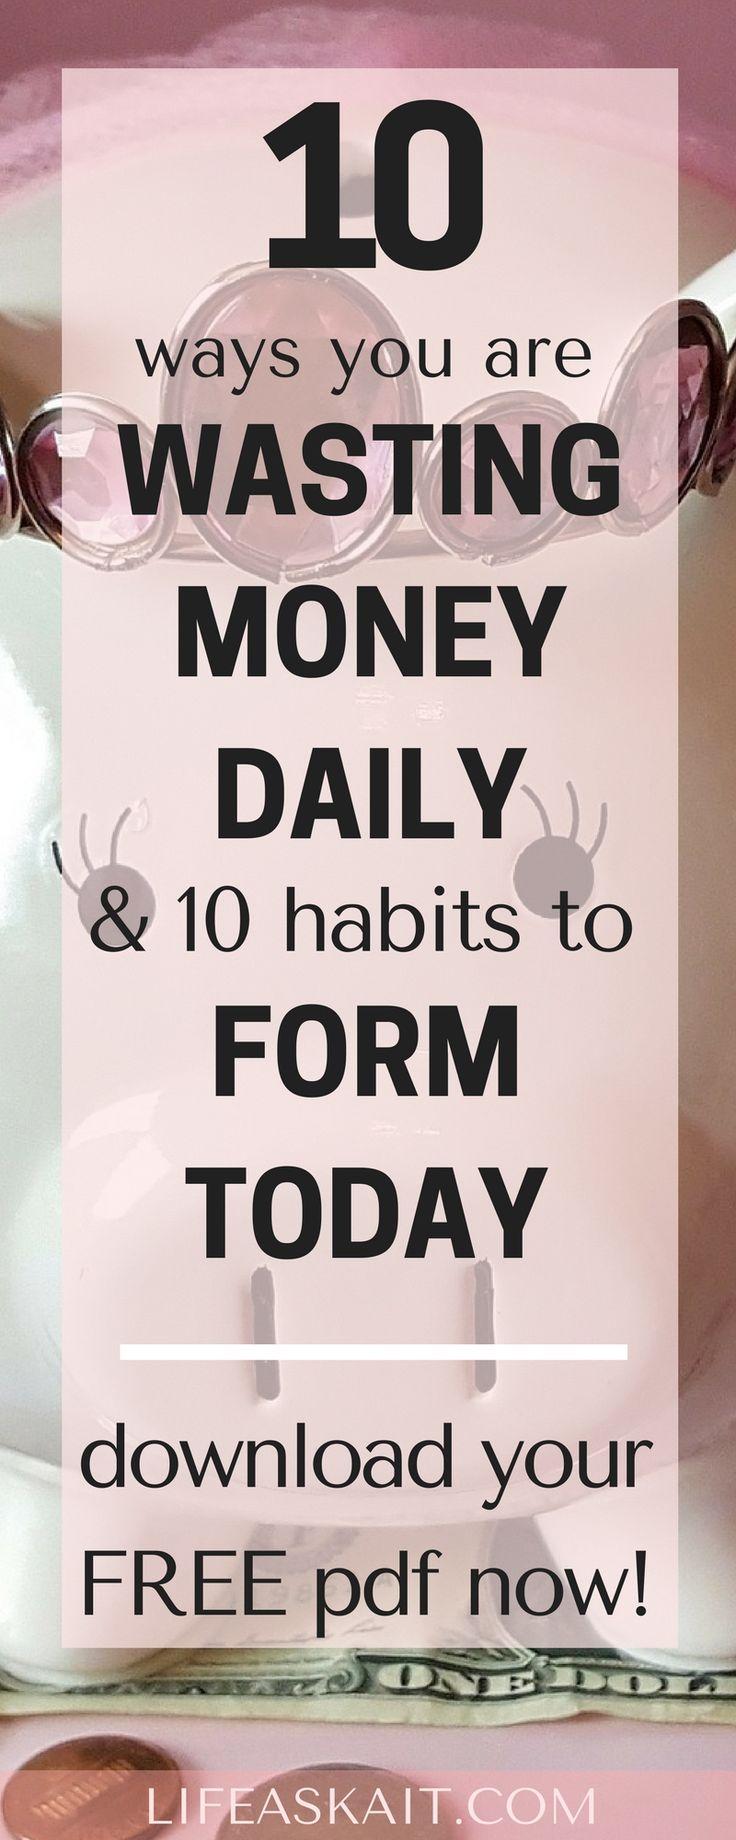 61 best money saving ideas images on pinterest money tips money saving money daily spending habits money habits financial finances fandeluxe Image collections